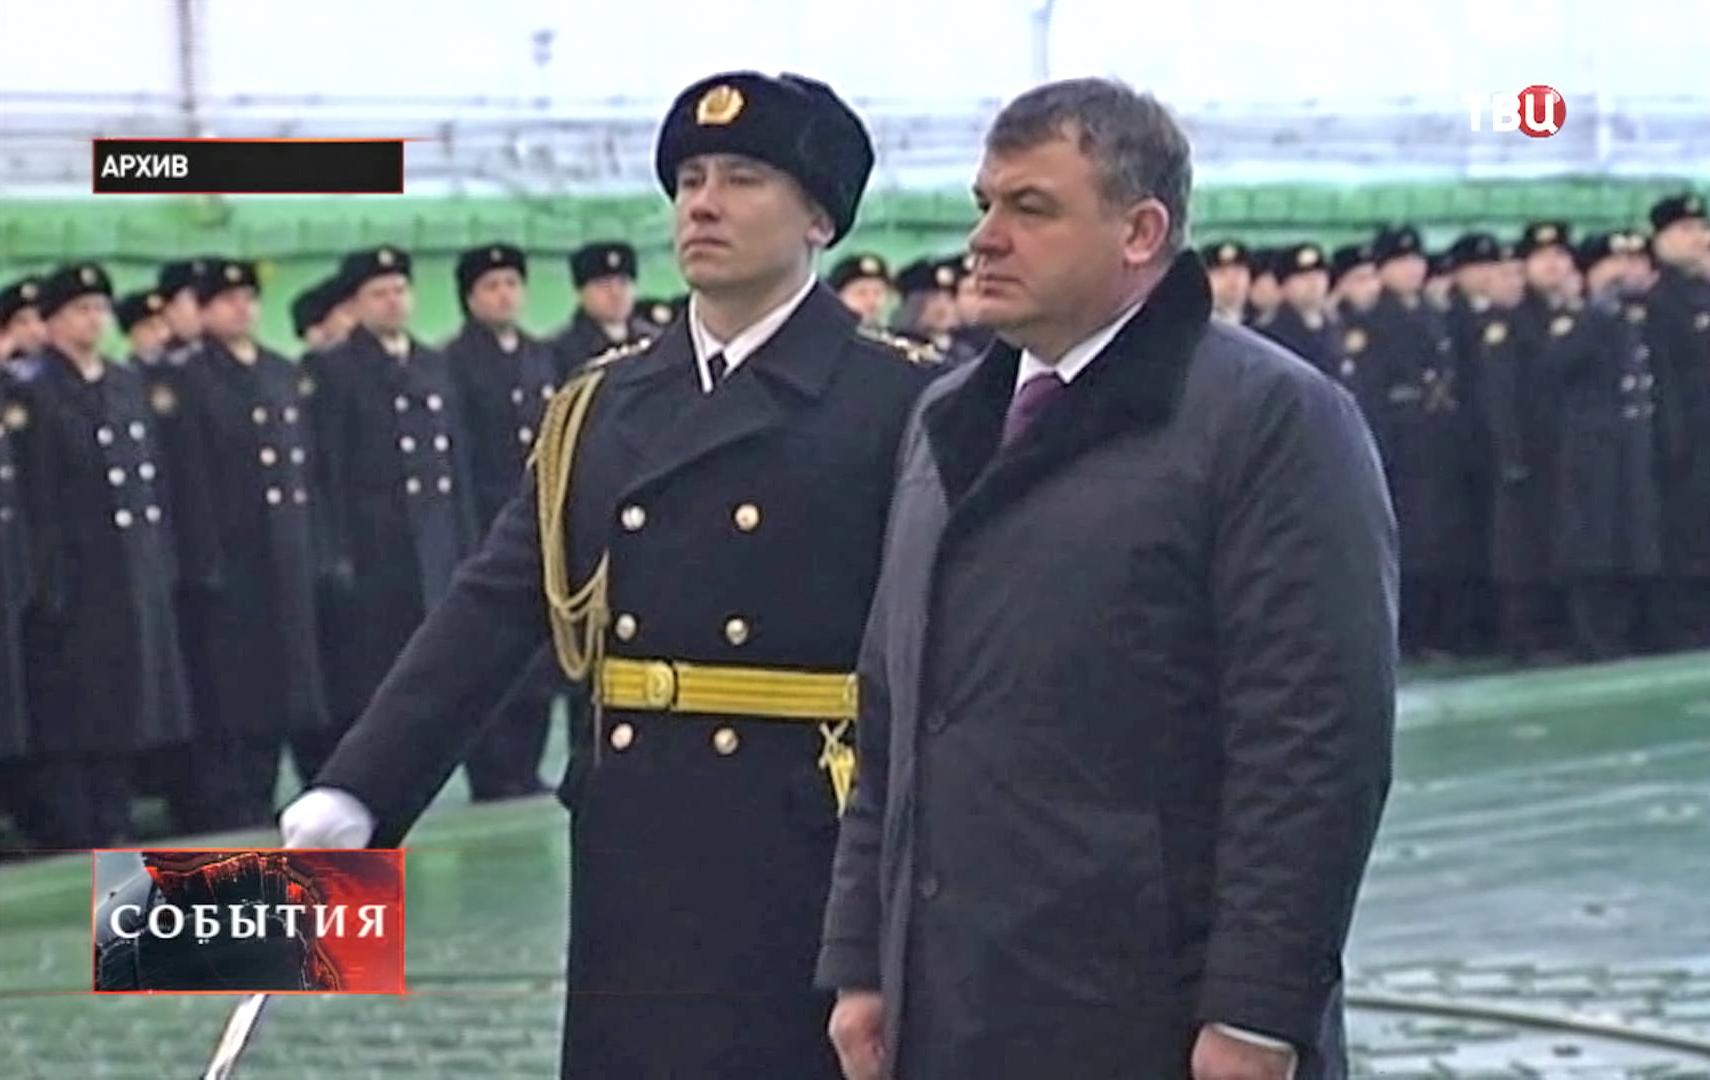 Экс-глава Минобороны РФ Анатолия Сердюкова